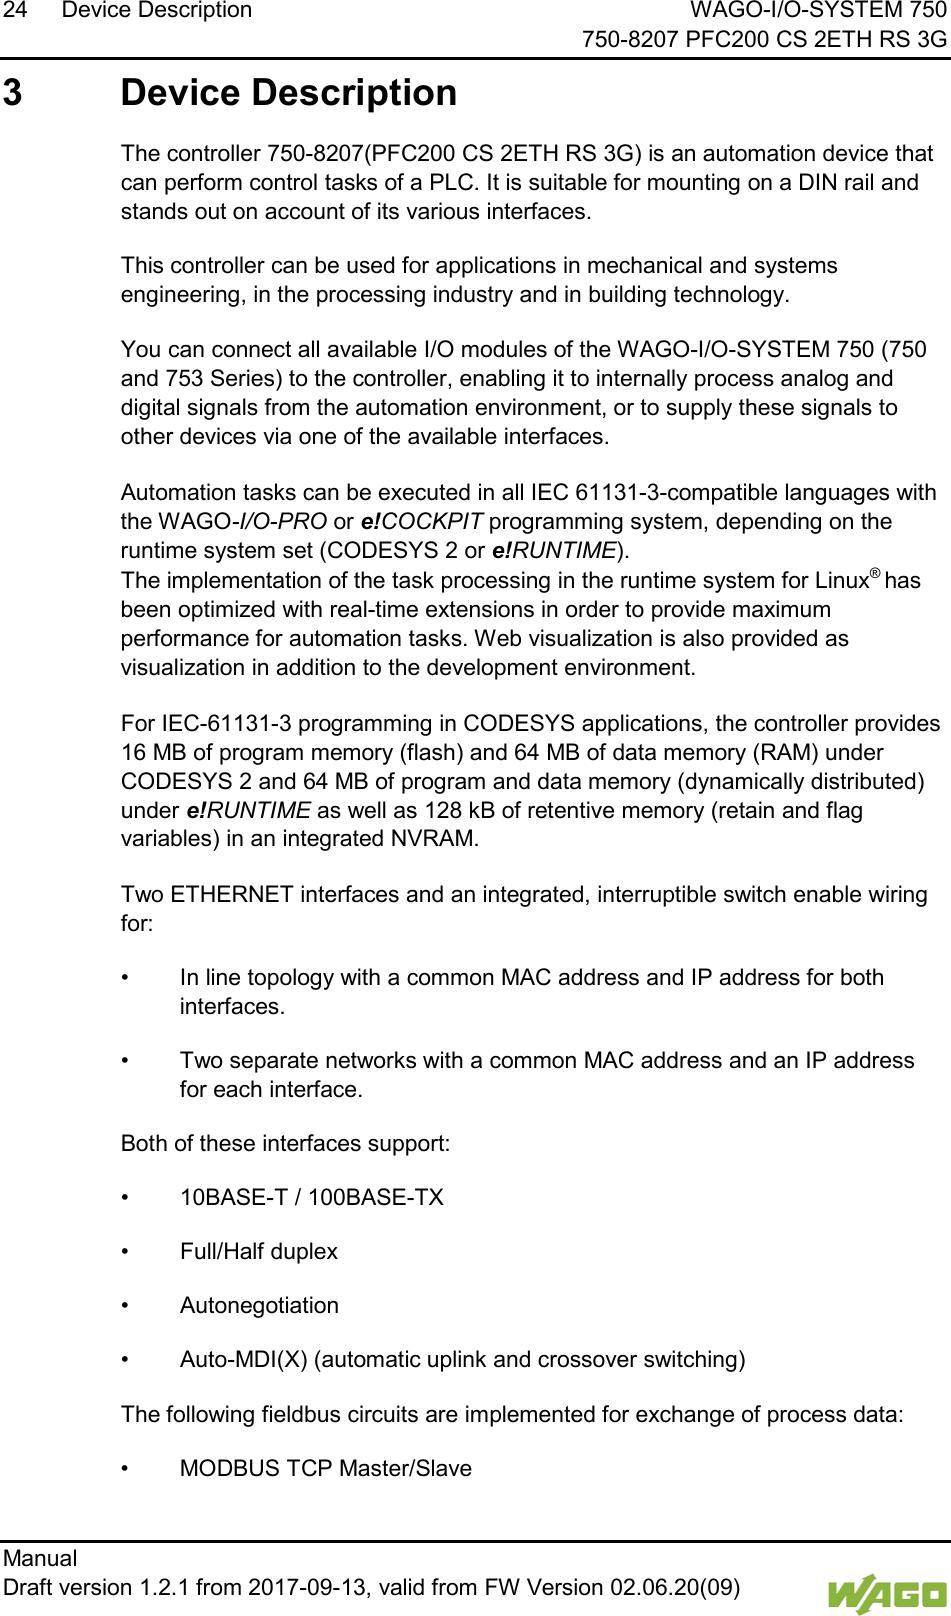 WAGO Kontakttechnik and KG PFC200 3G PLC Controller User Manual